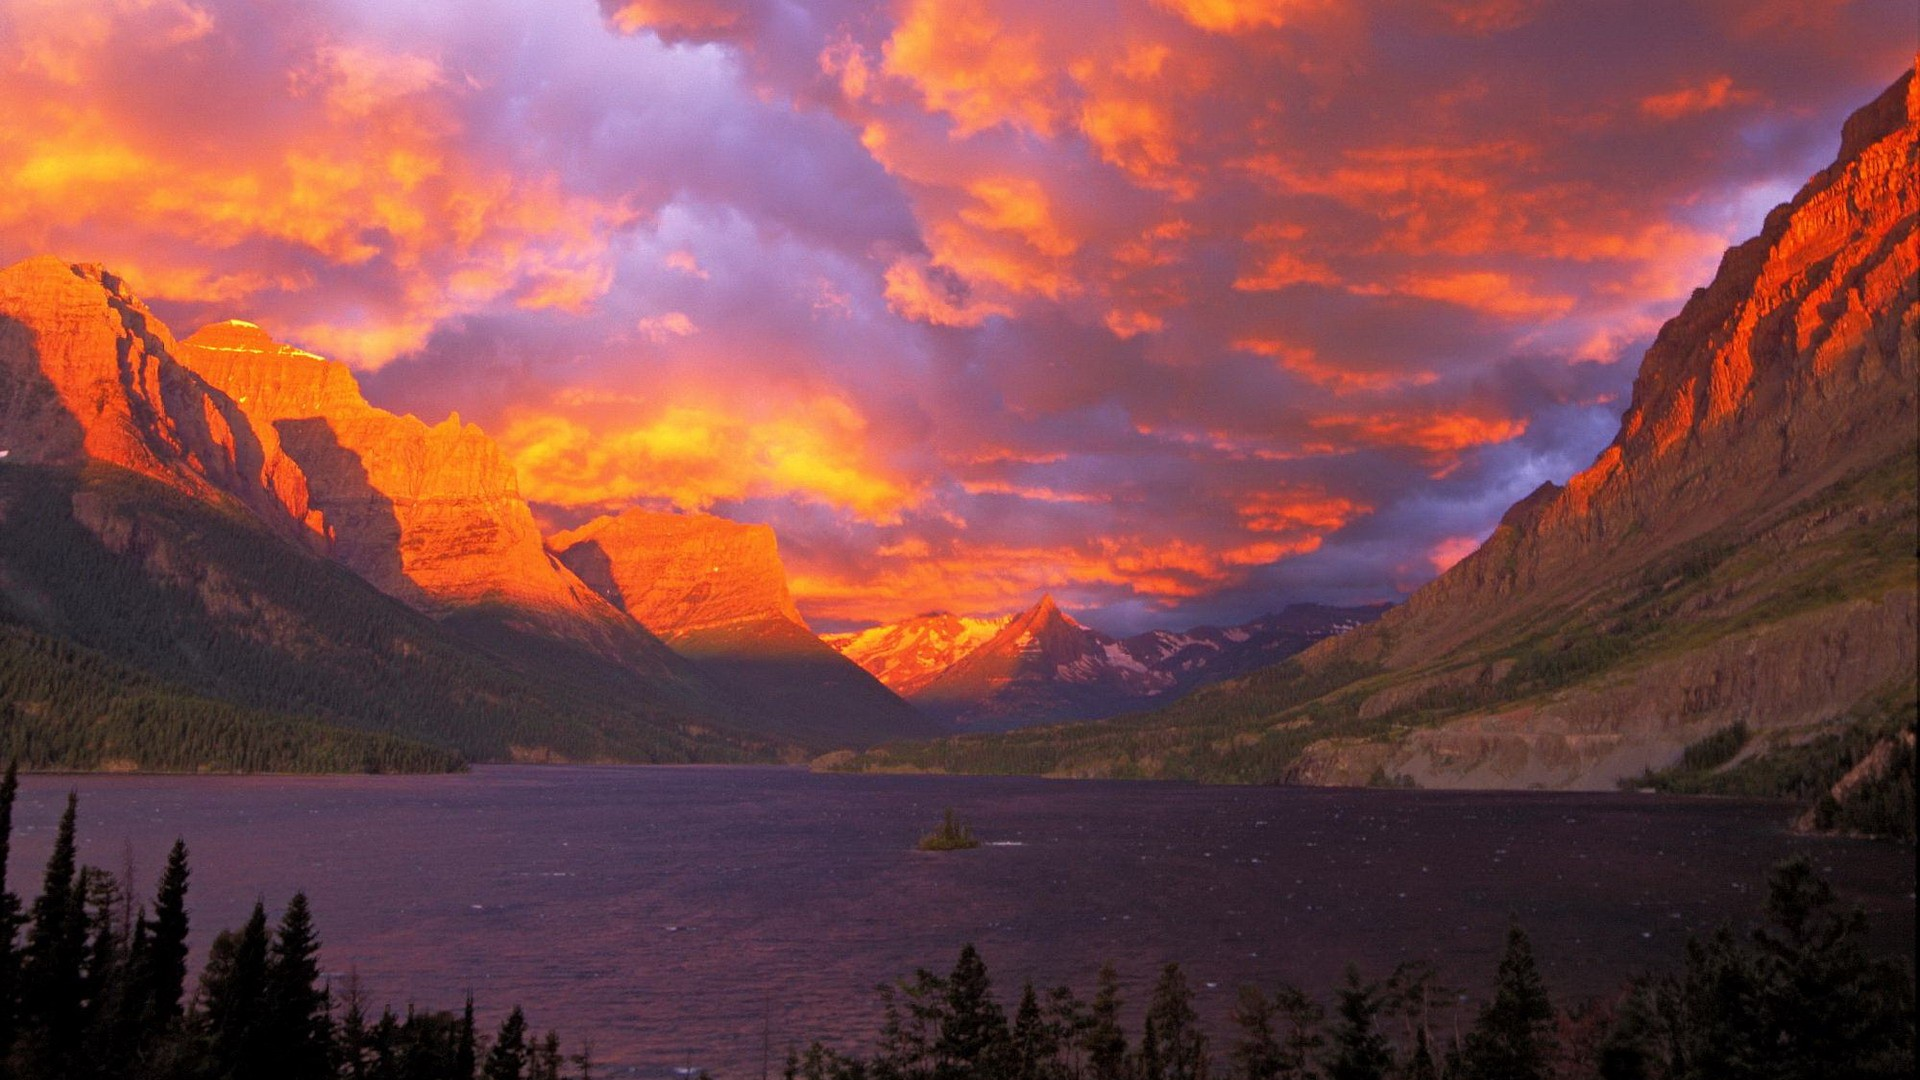 sunrise National Park Glacier National Park Saint Mary Lake wallpaper 1920x1080